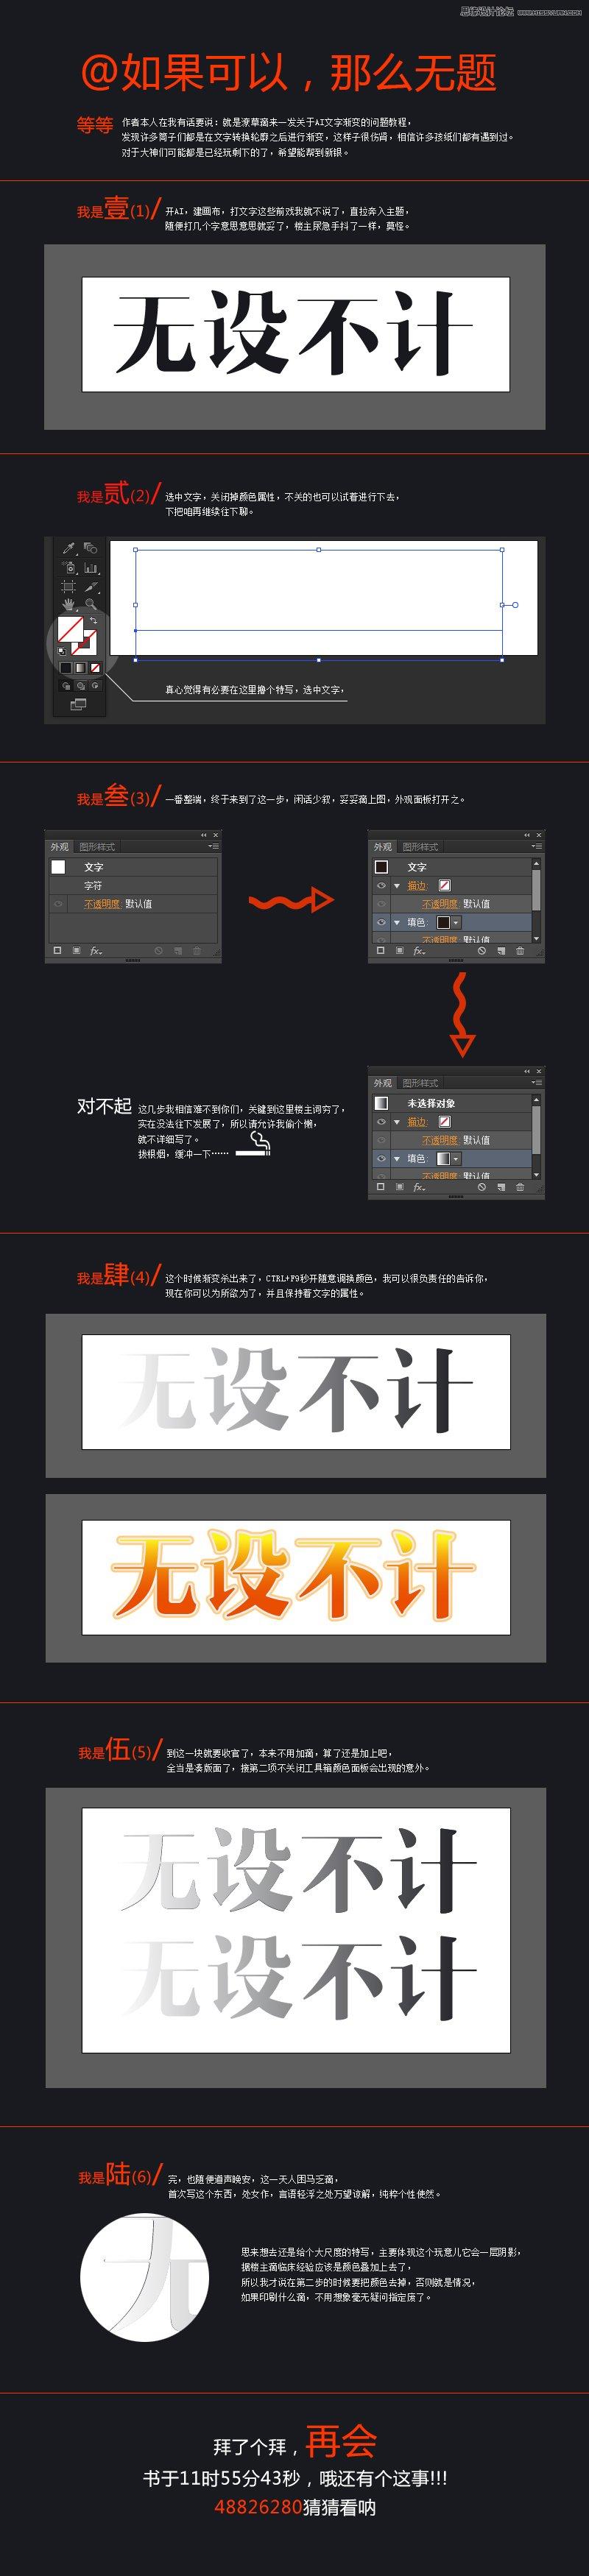 Illustrator通过实例讲解文字渐变的绘制技巧